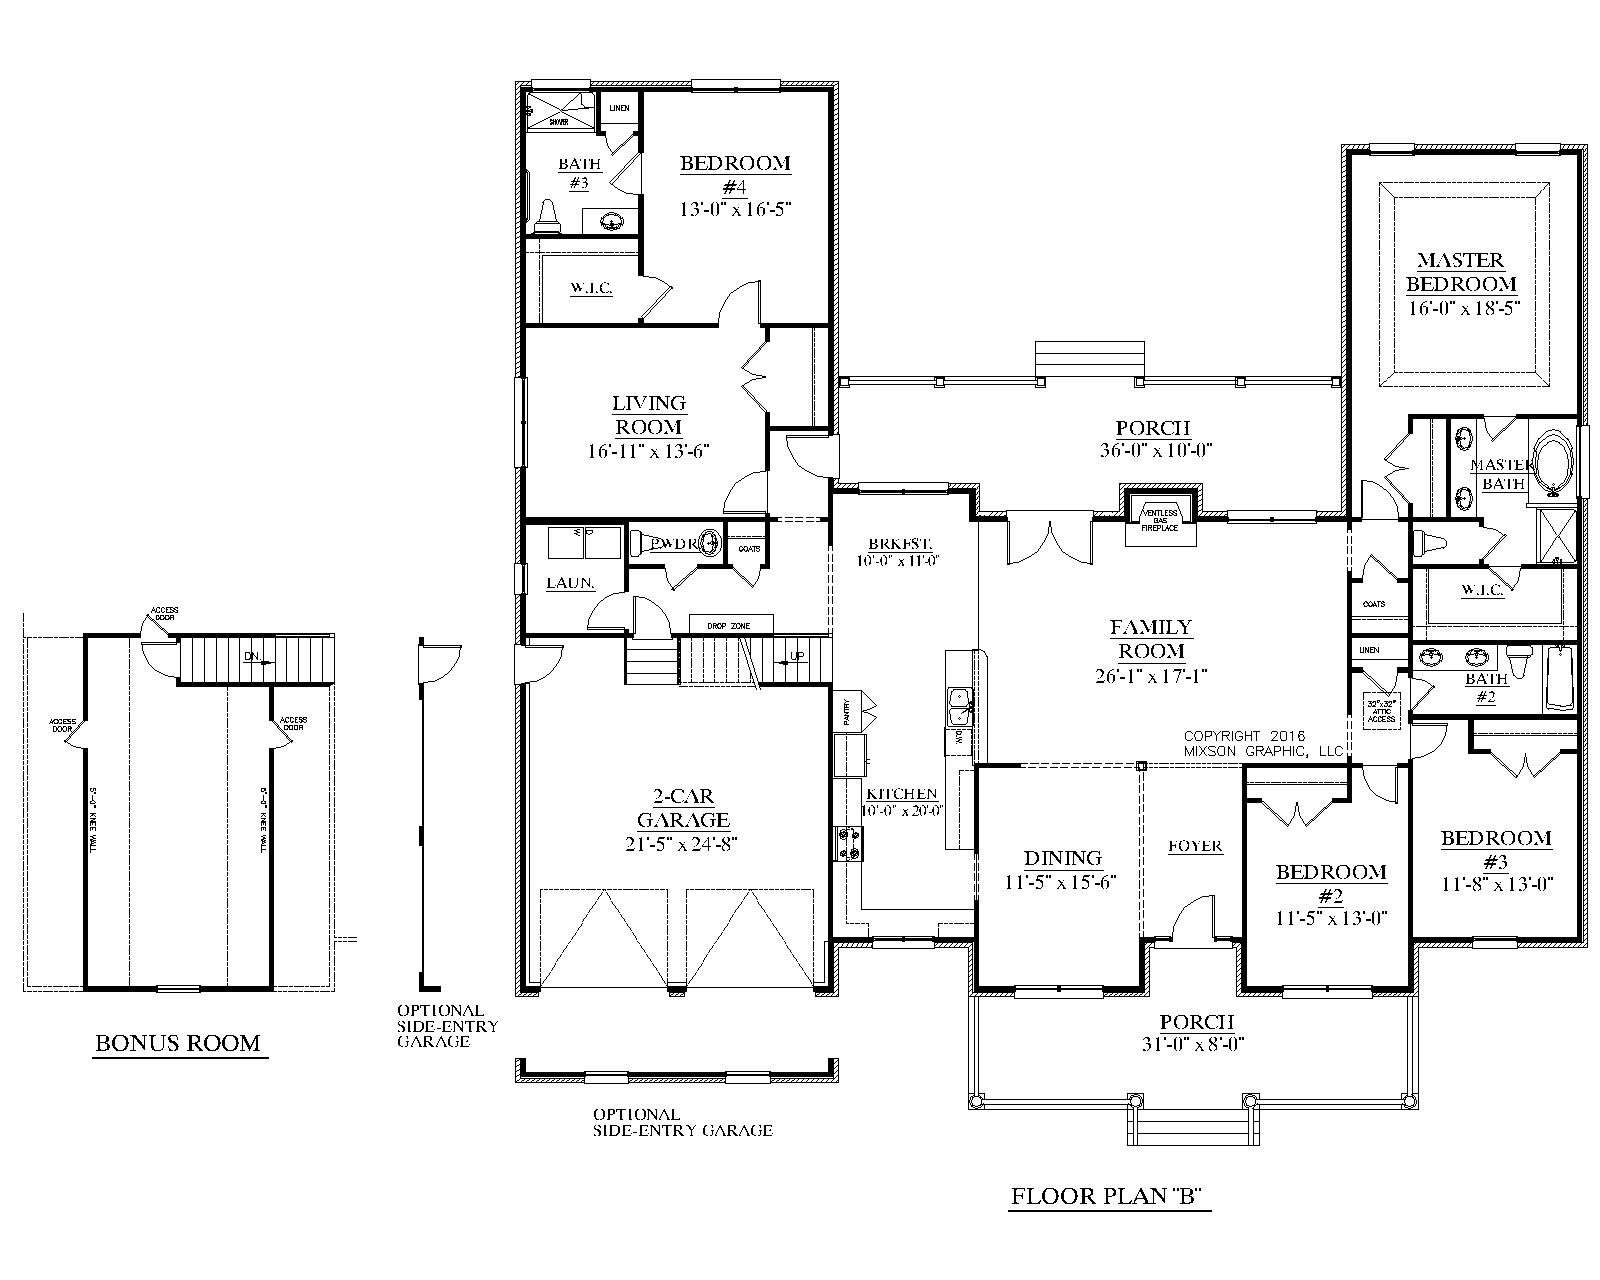 House Plan 2990 B The Arlington B House Plans One Level Homes Floor Plans